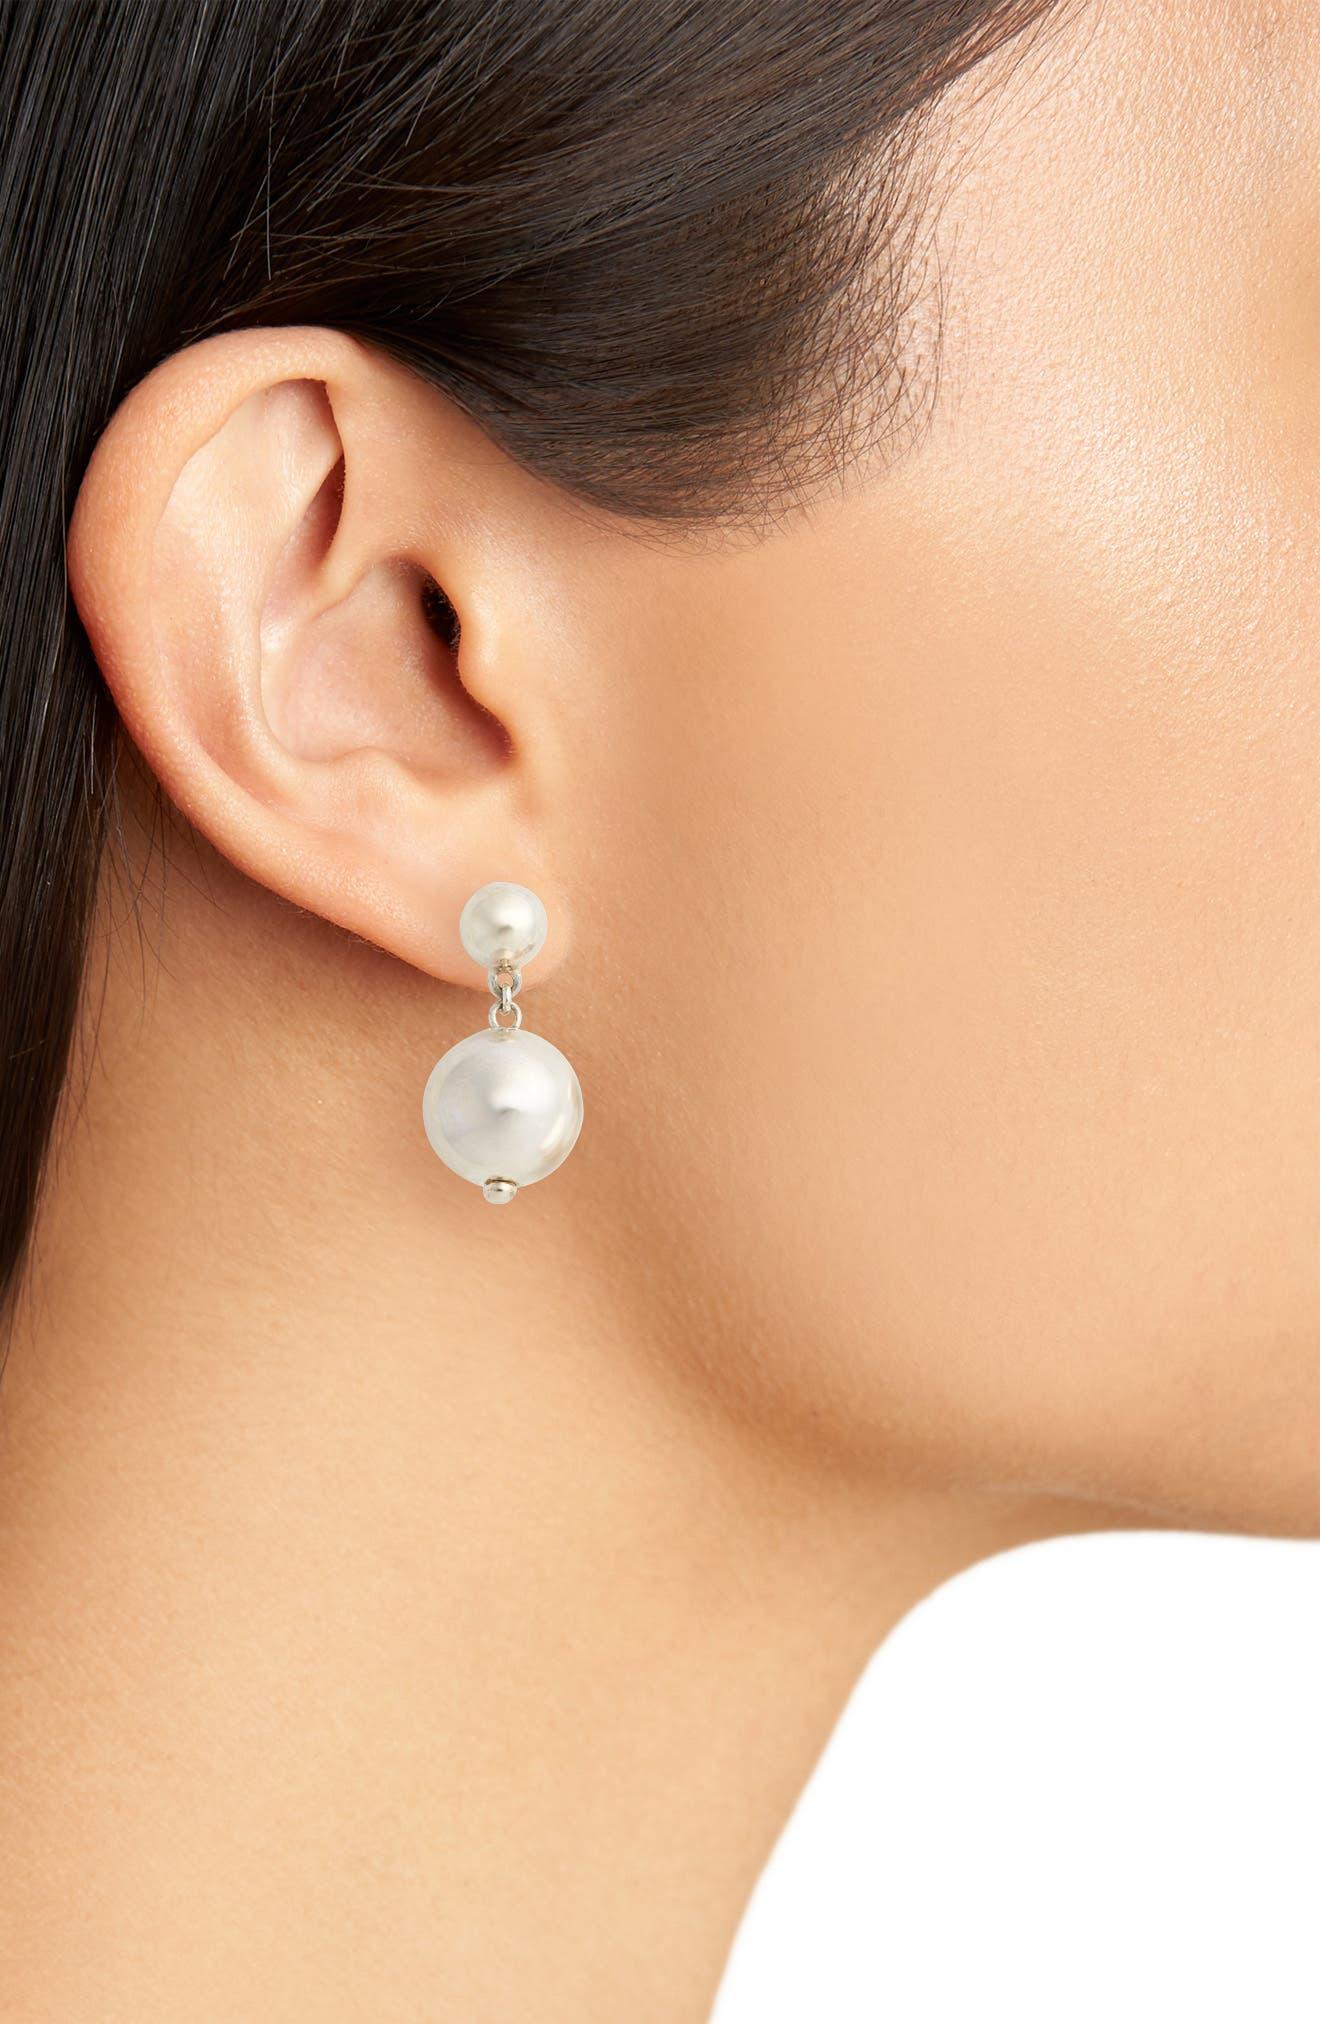 Sterling Silver Ball Drop Earrings,                             Alternate thumbnail 2, color,                             040